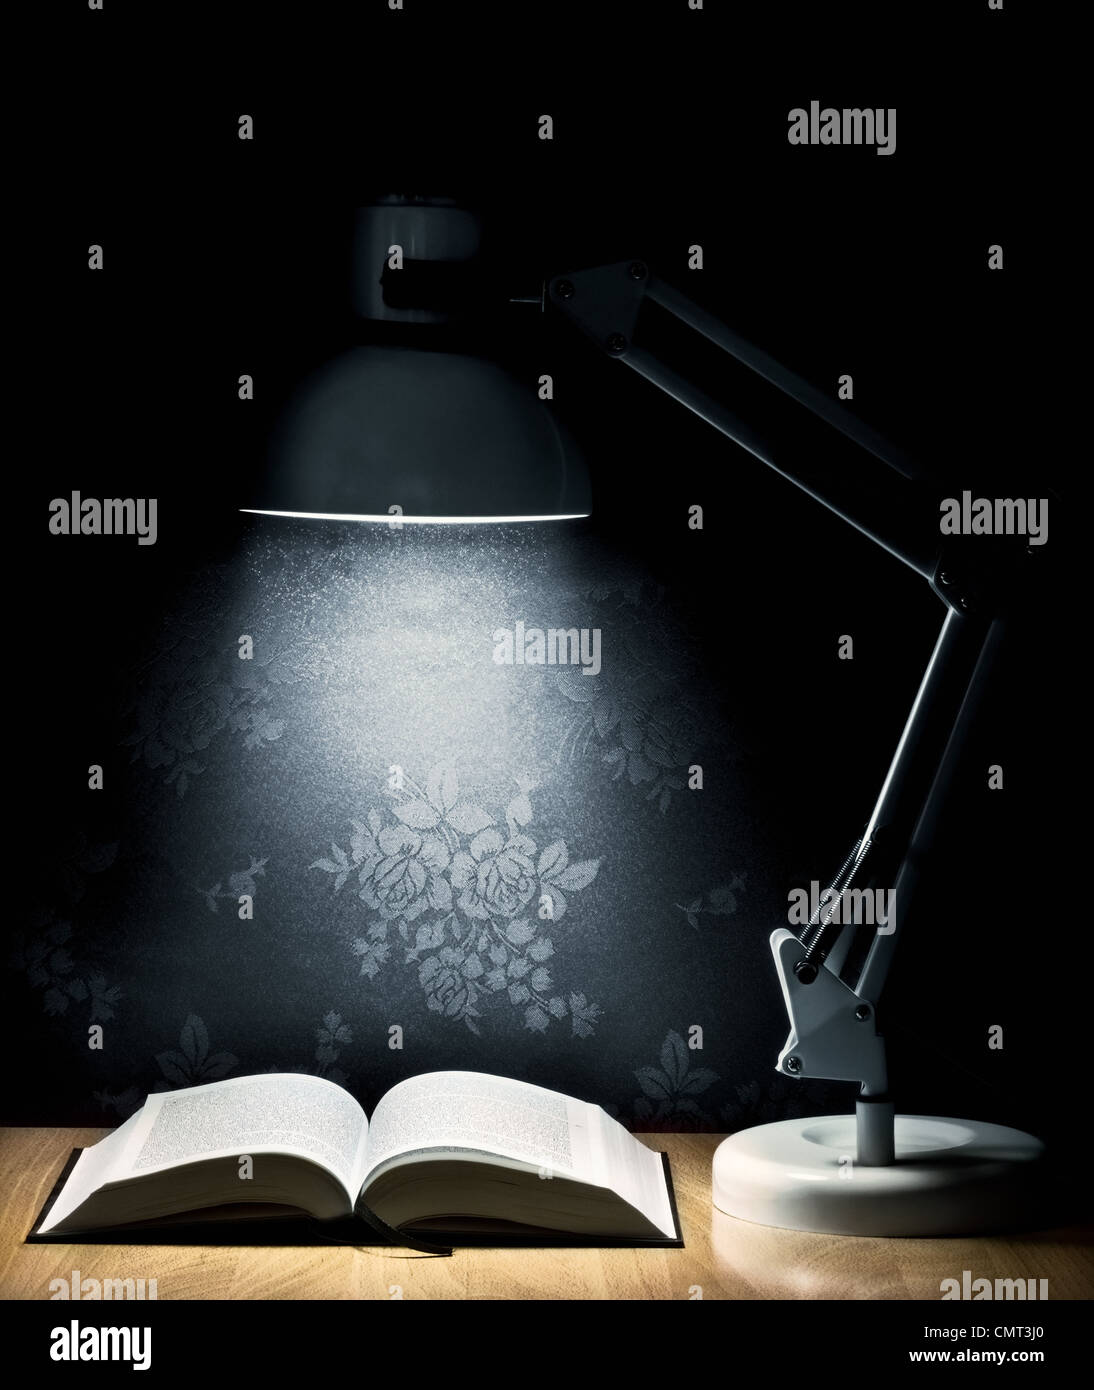 Lamp that illuminates an open book - Stock Image